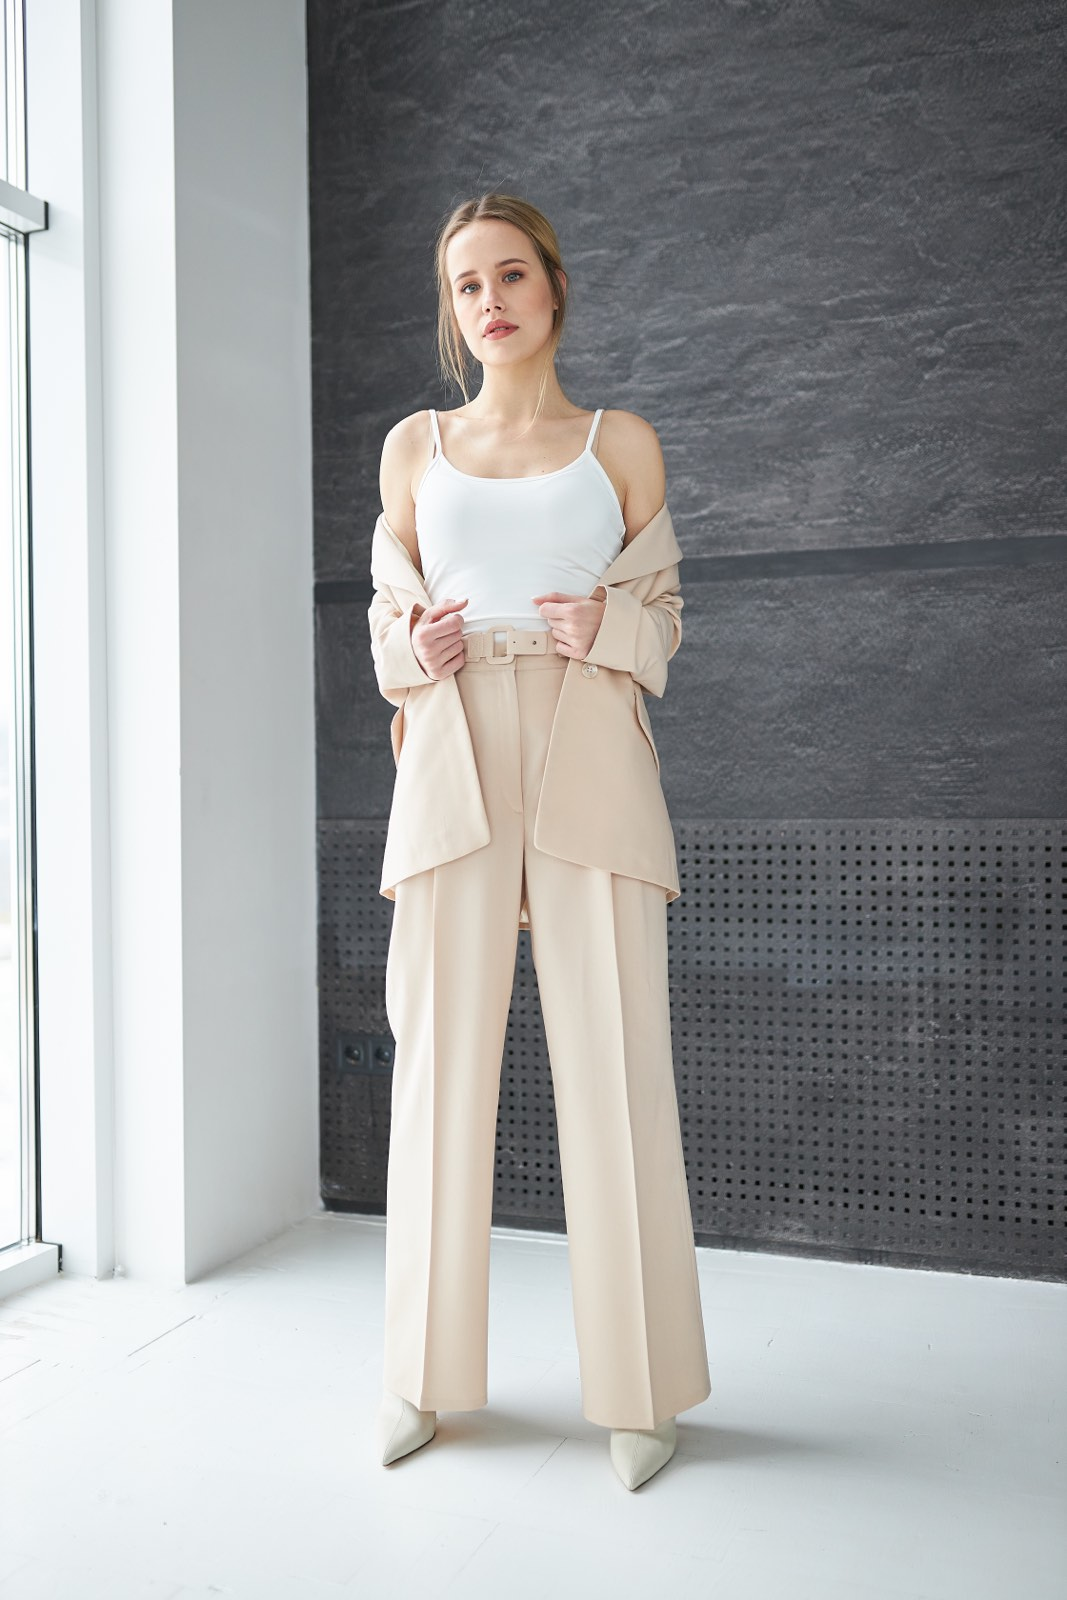 Kostyum ZHyuli 9 Купить верхнюю одежду оптом